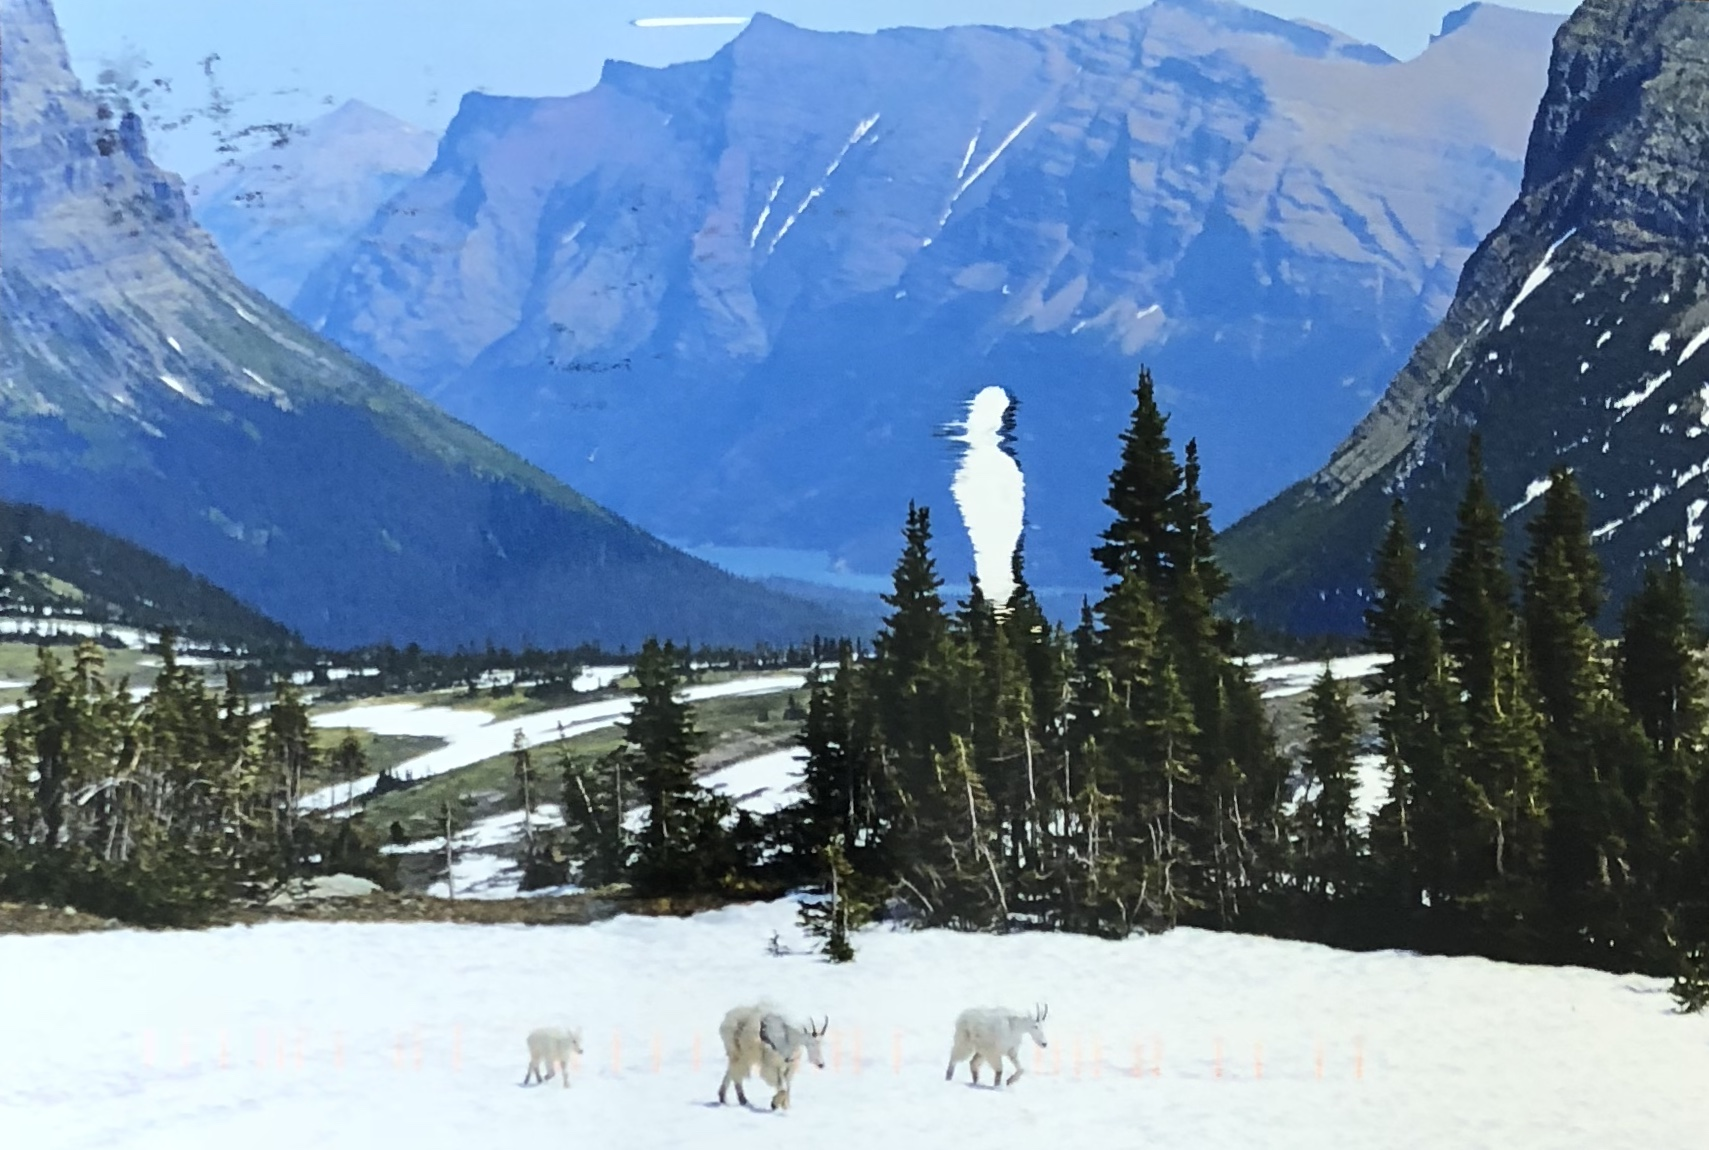 Mountain goats in Glacier National Park, Montana.